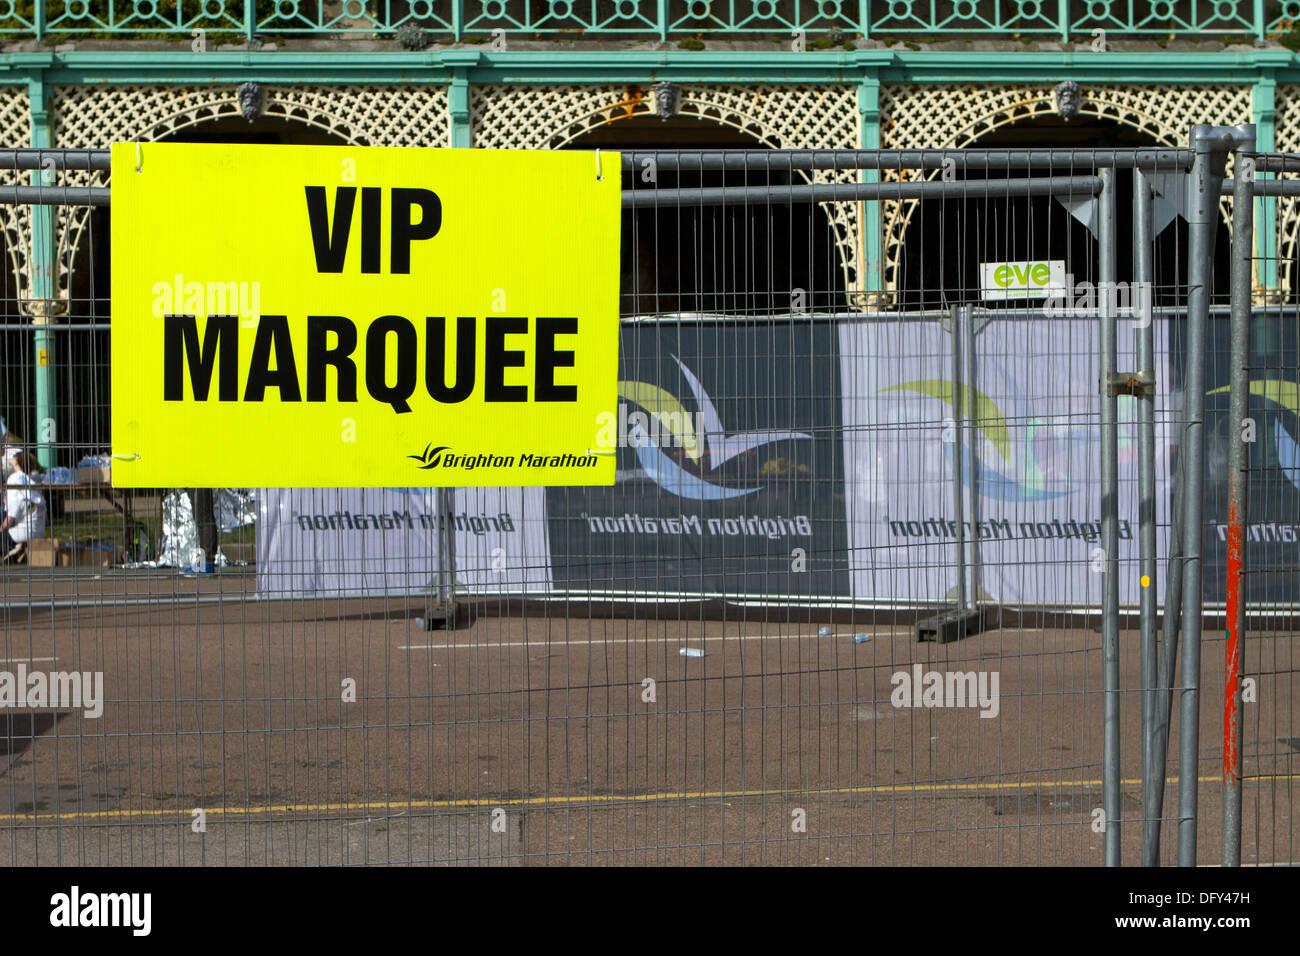 VIP area at the end of the Brighton Marathon. - Stock Image